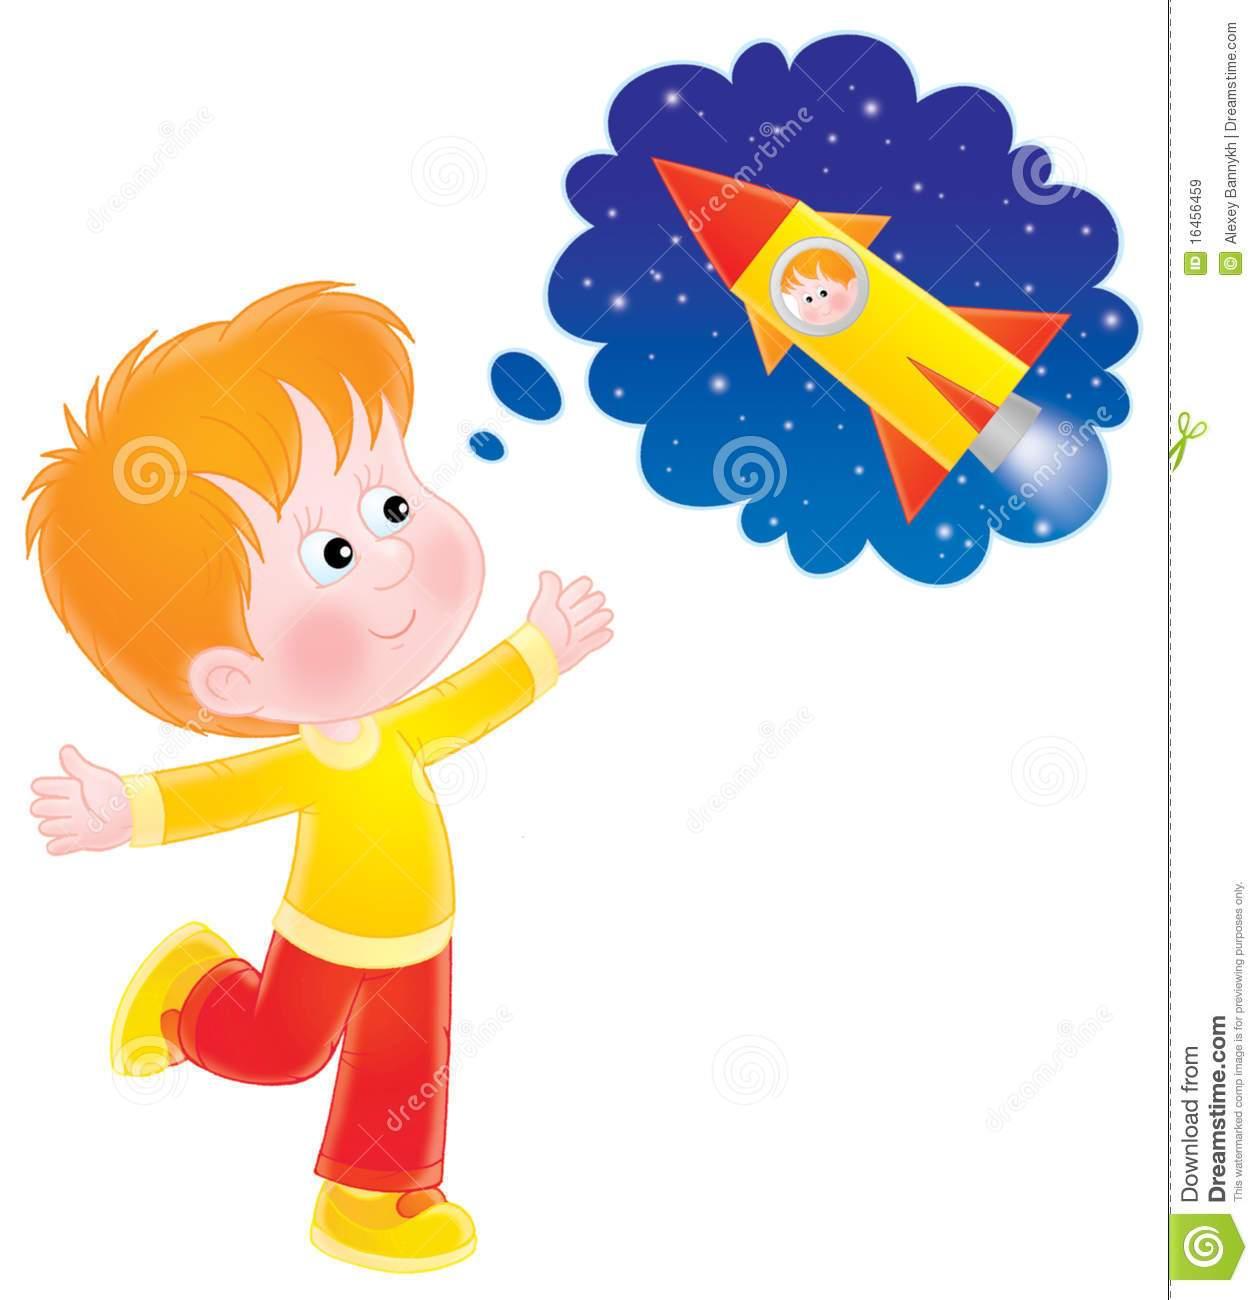 Boy dreaming clipart 5 » Clipart Portal.